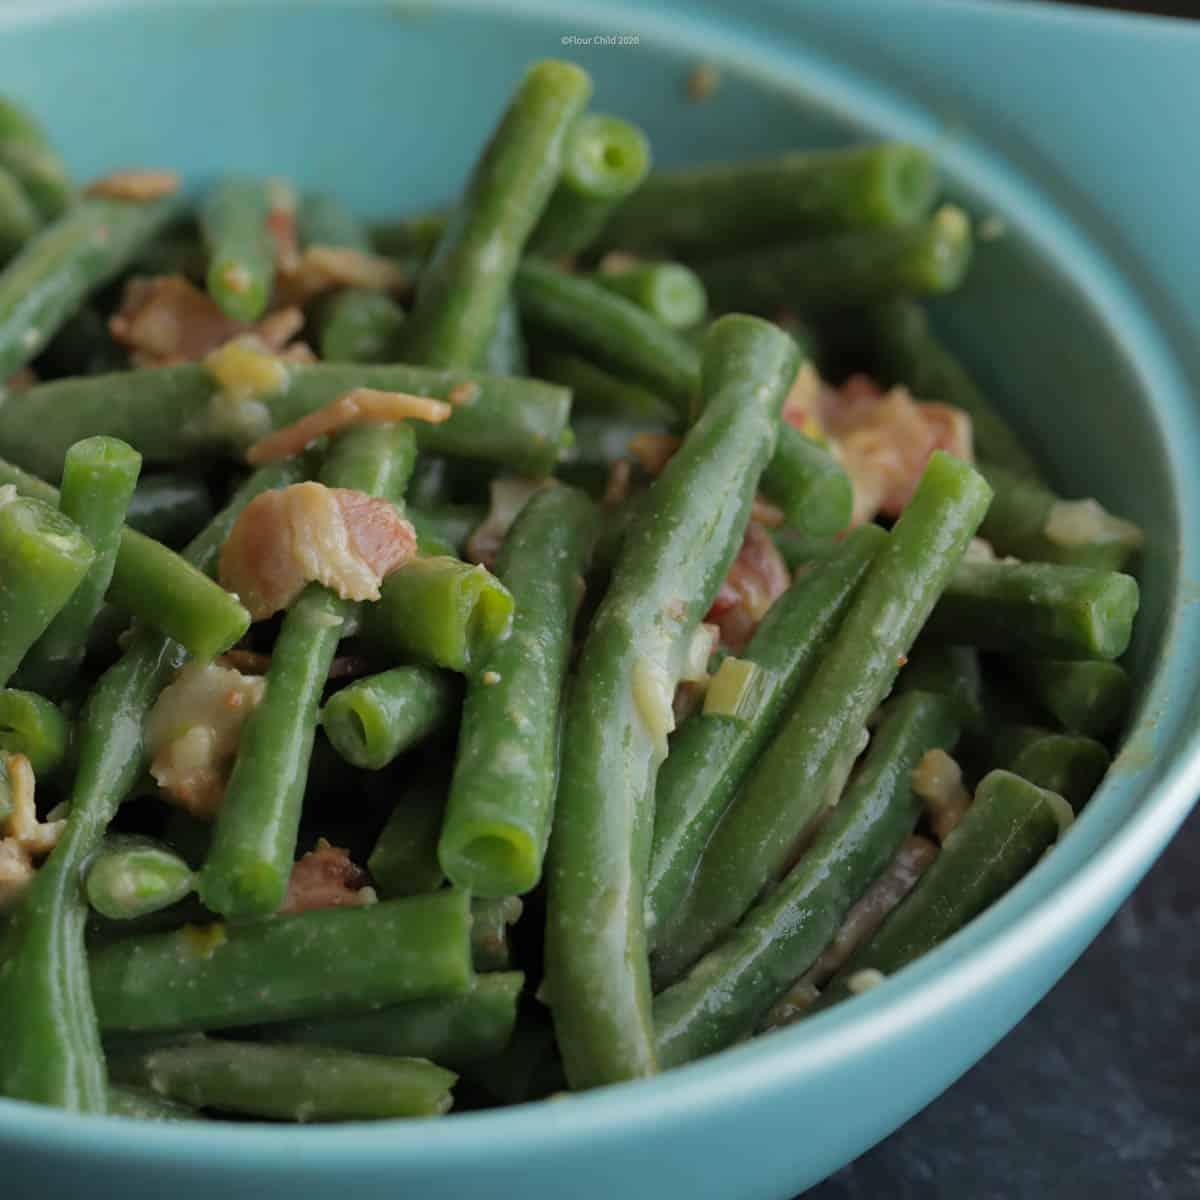 Bowl of fresh green beans dijon in a blue serving bowl